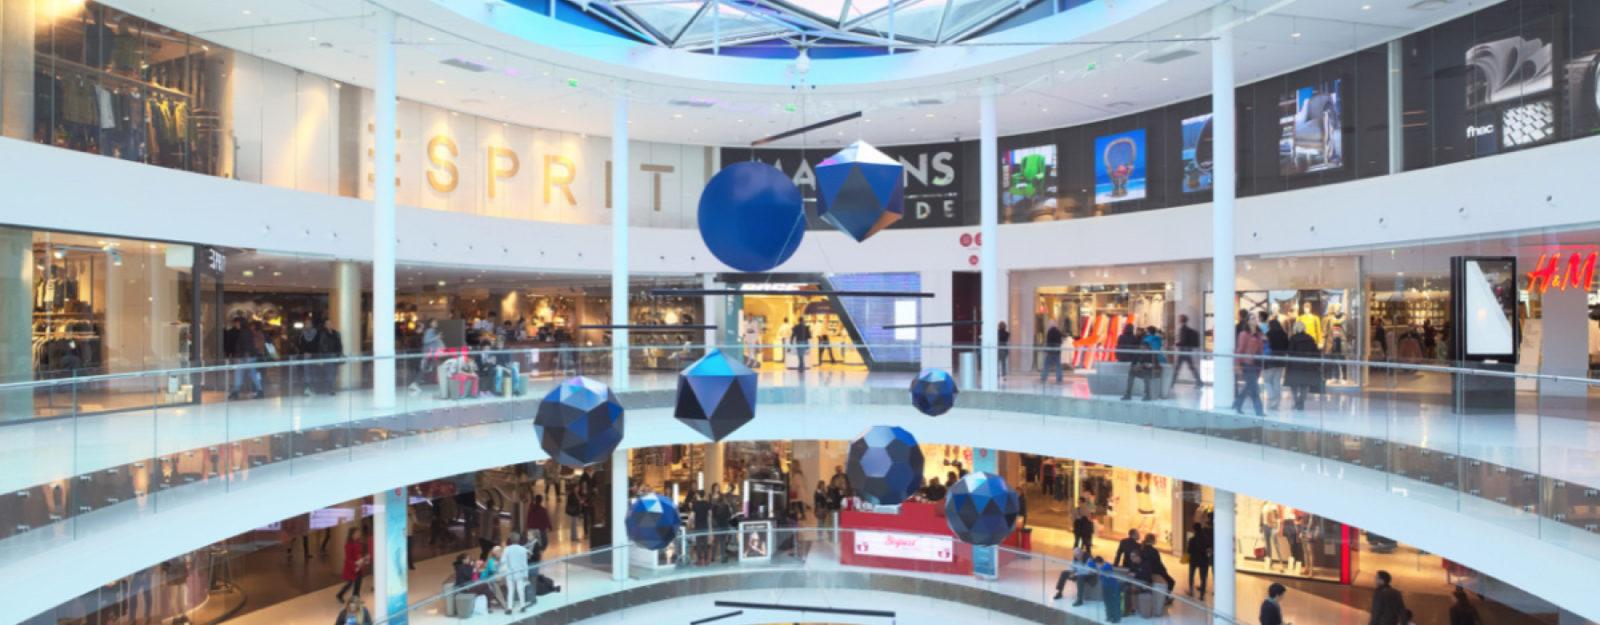 Image du Centre commercial Beaugrenelle